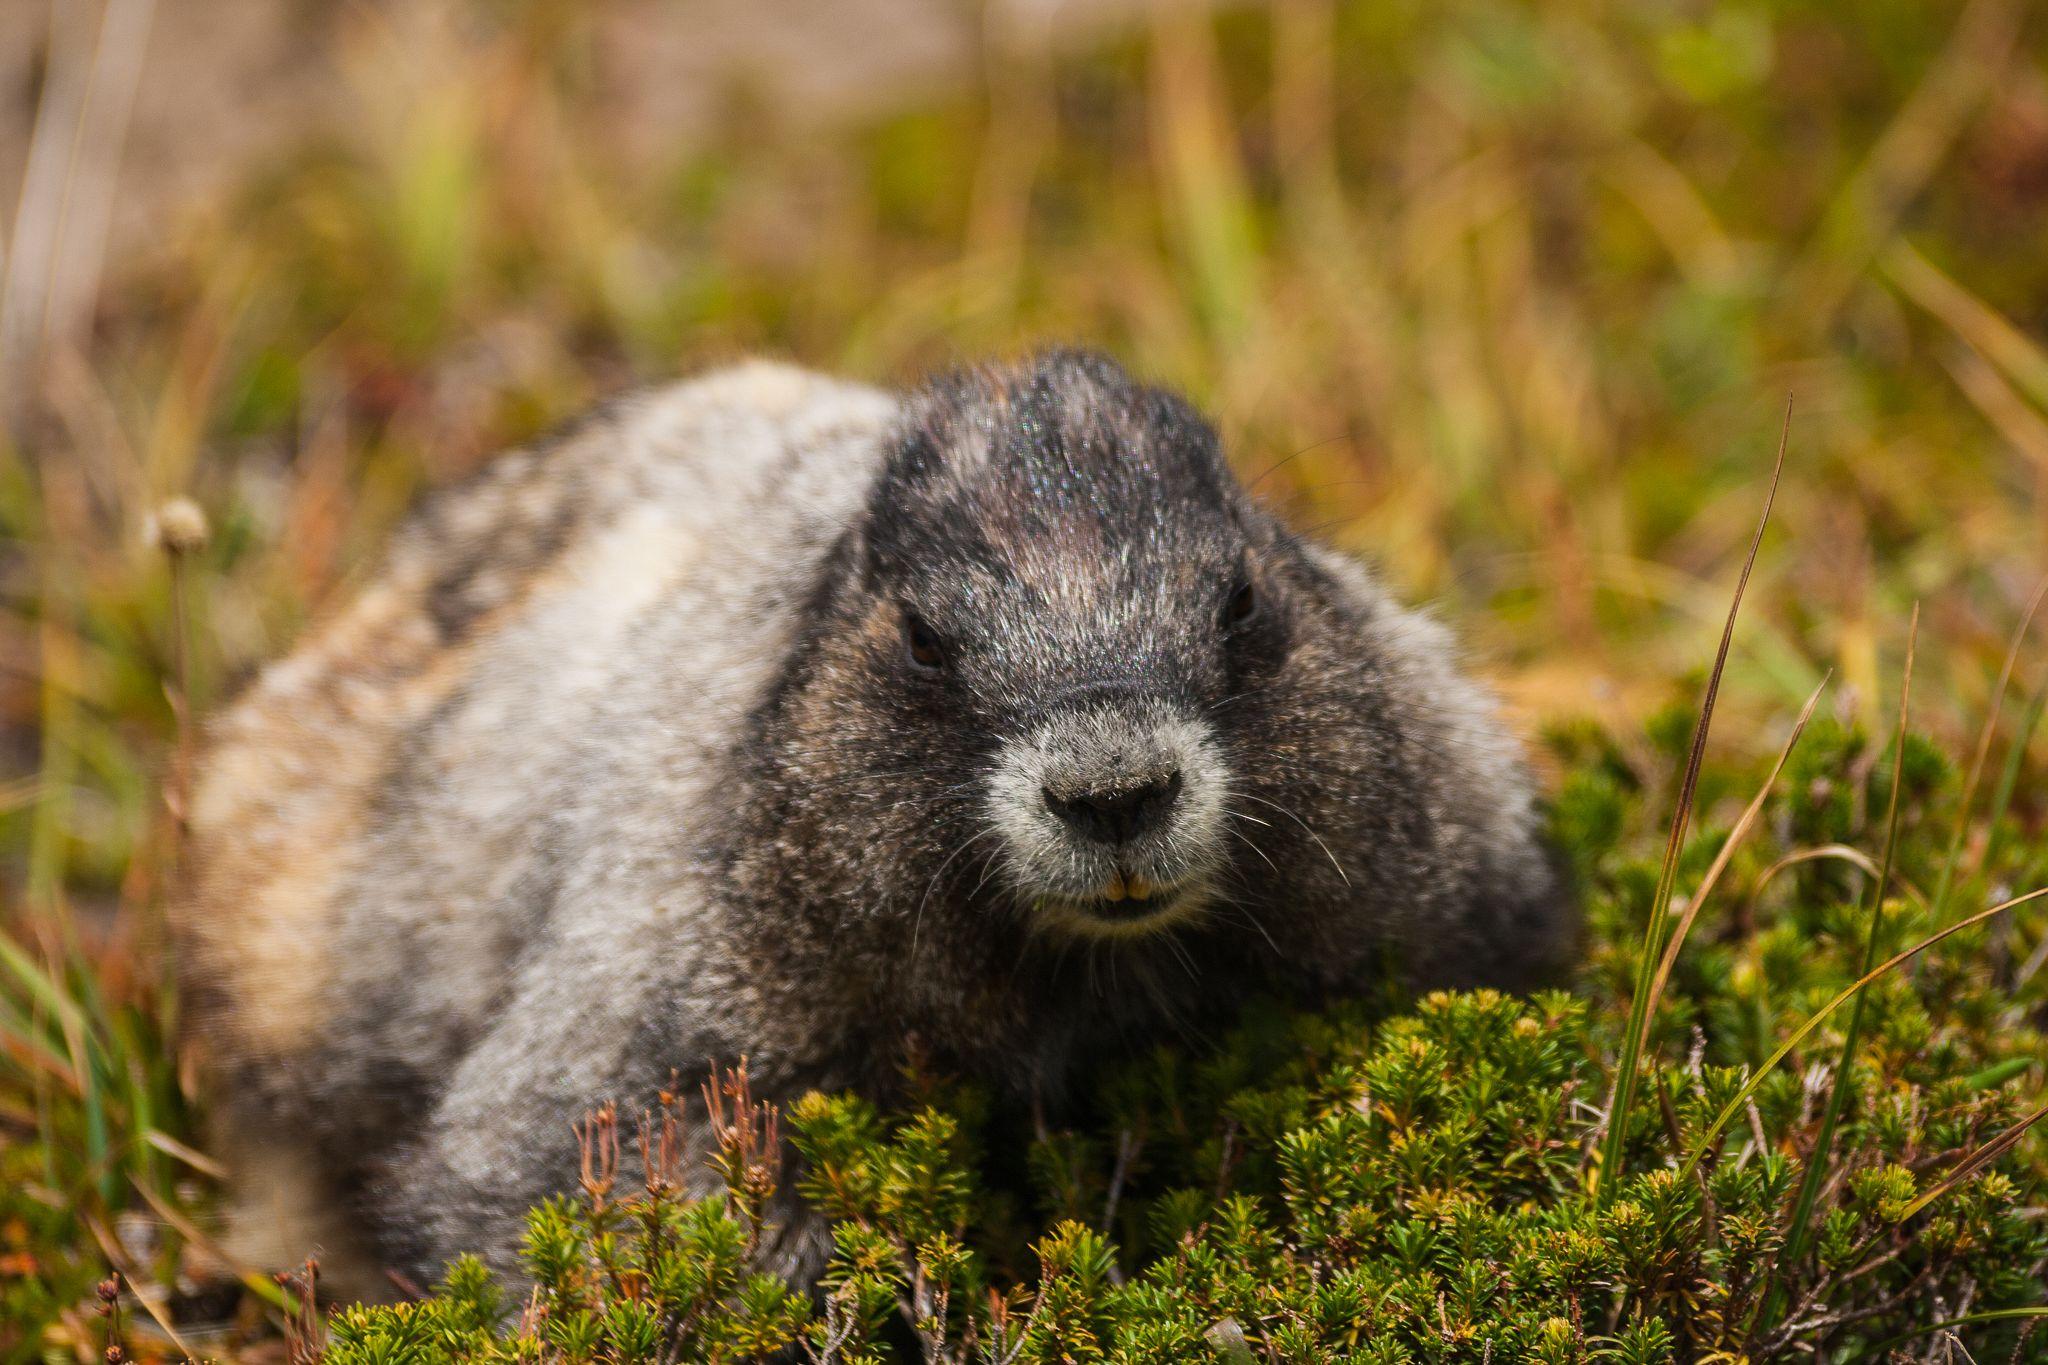 Marmot sitting on grass